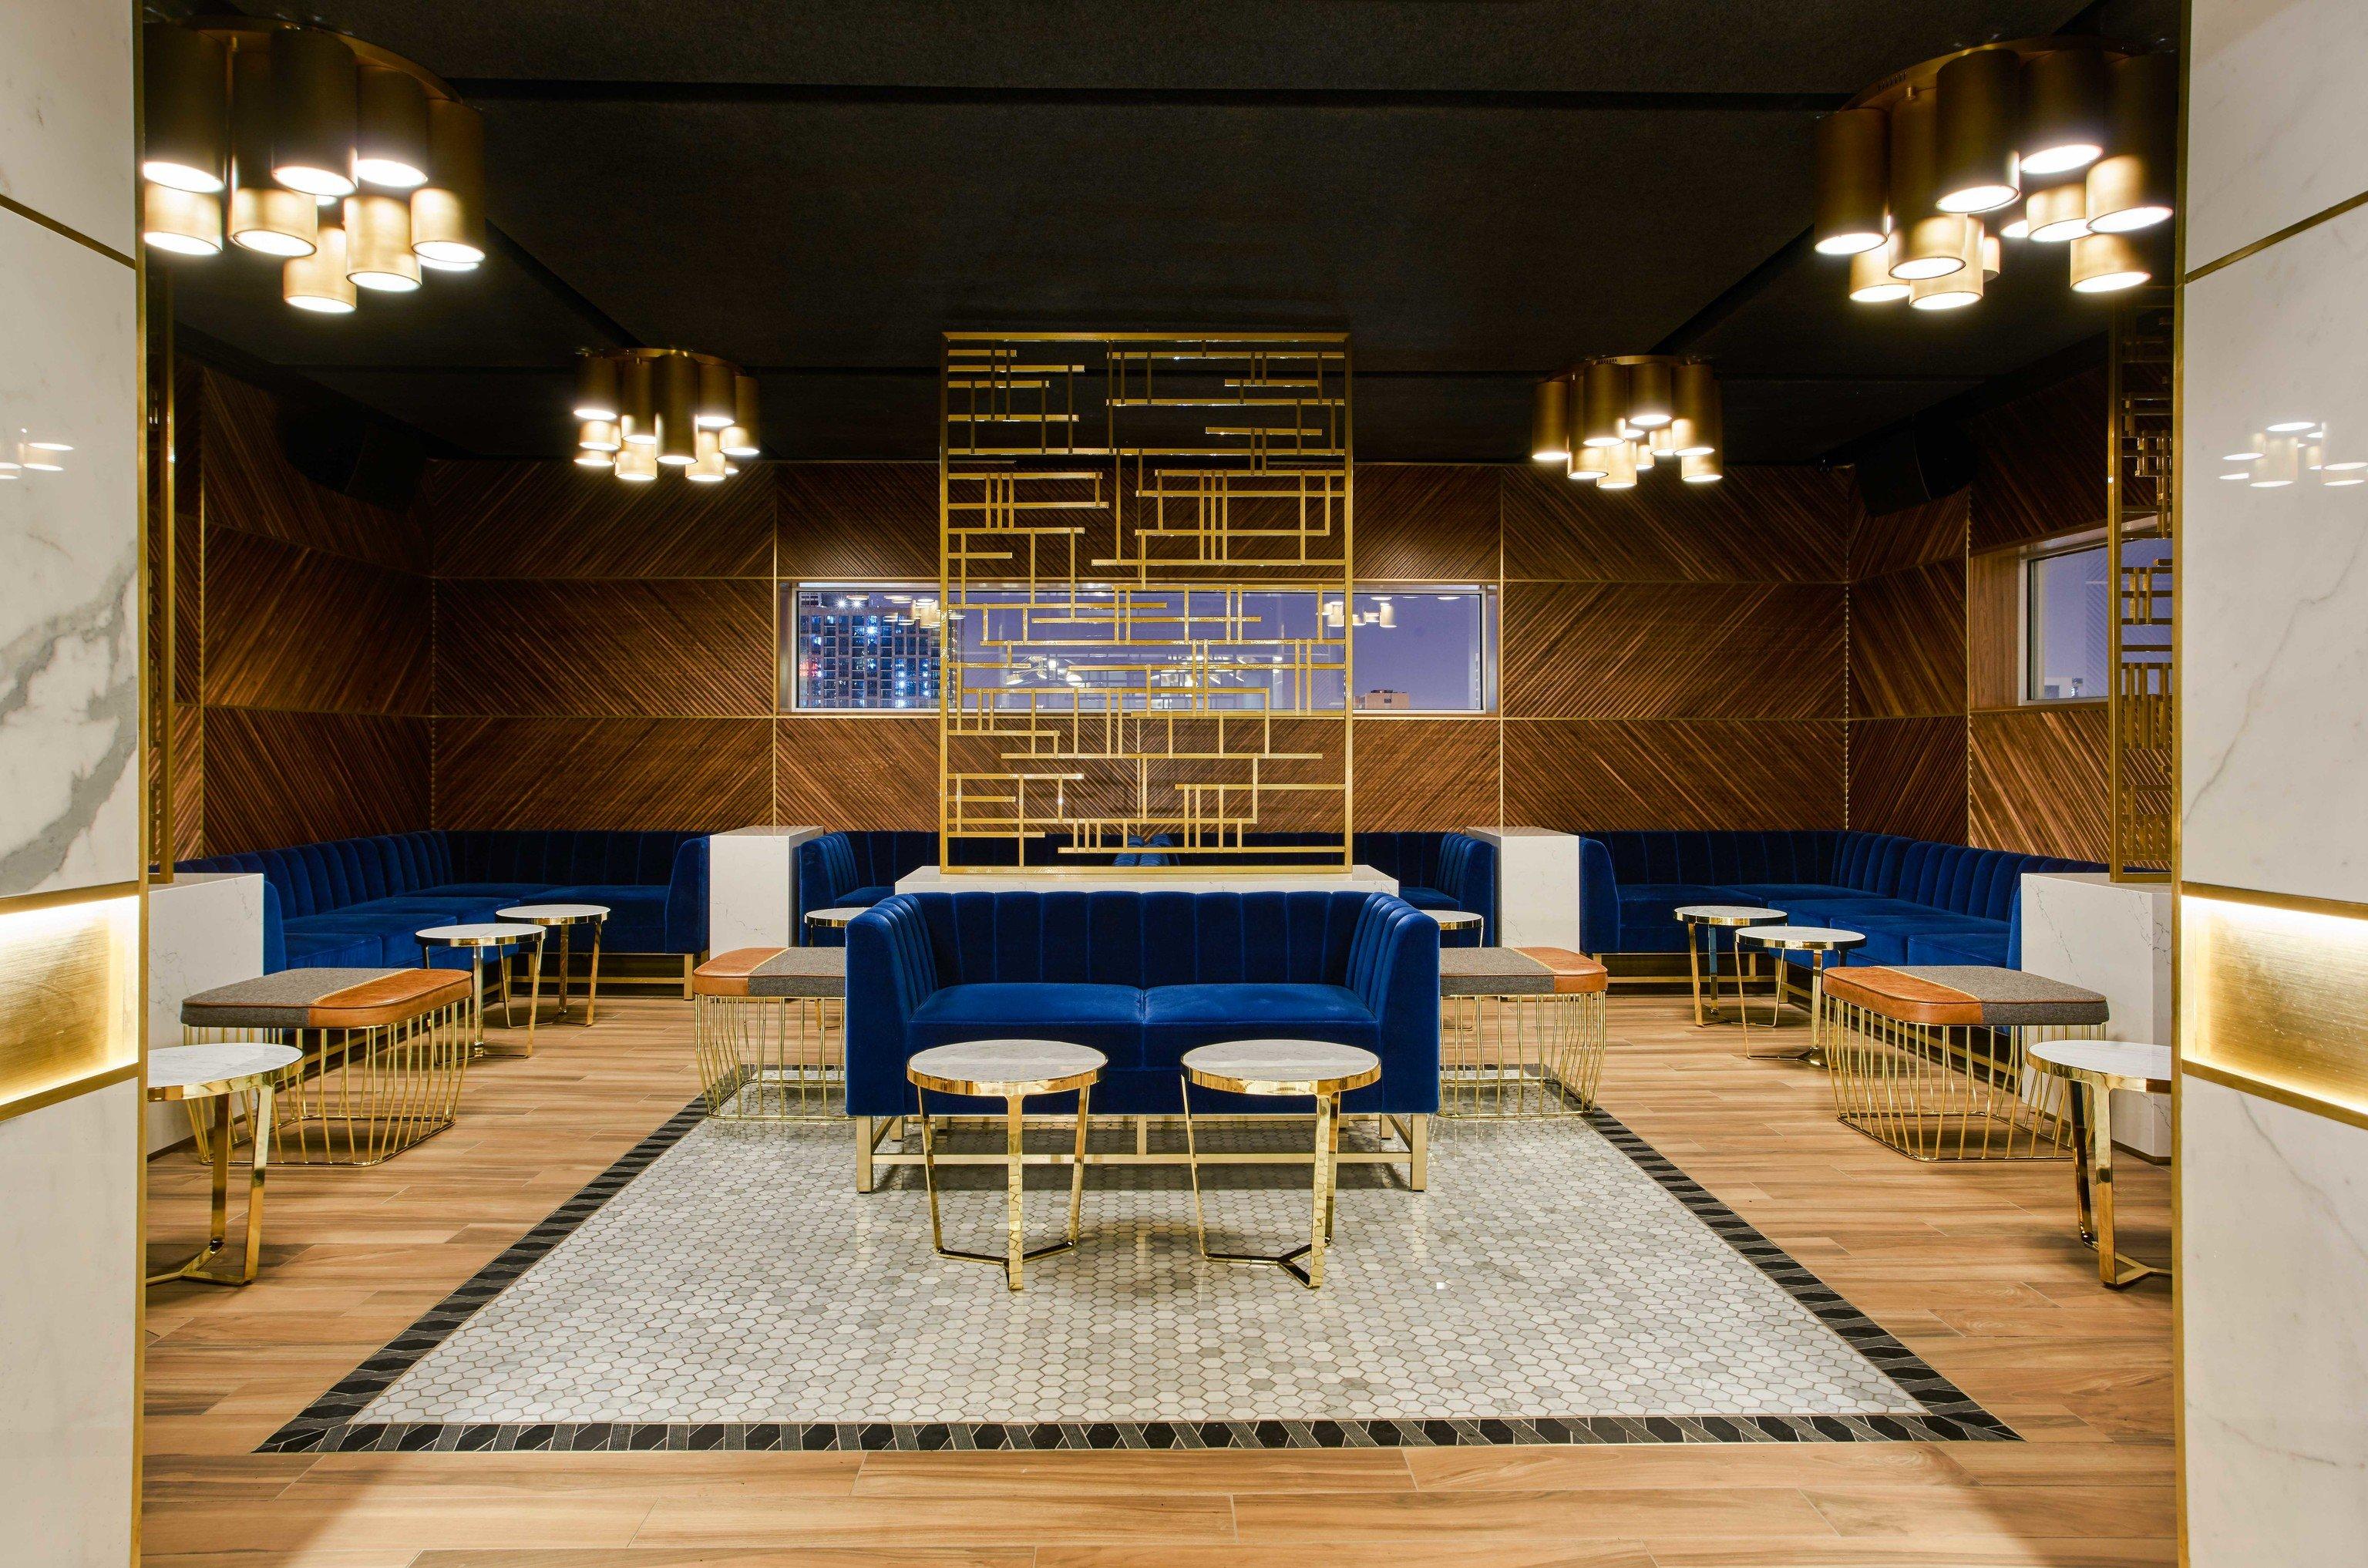 Arts + Culture Food + Drink Hotels Weekend Getaways indoor floor chair interior design room ceiling furniture Lobby restaurant table